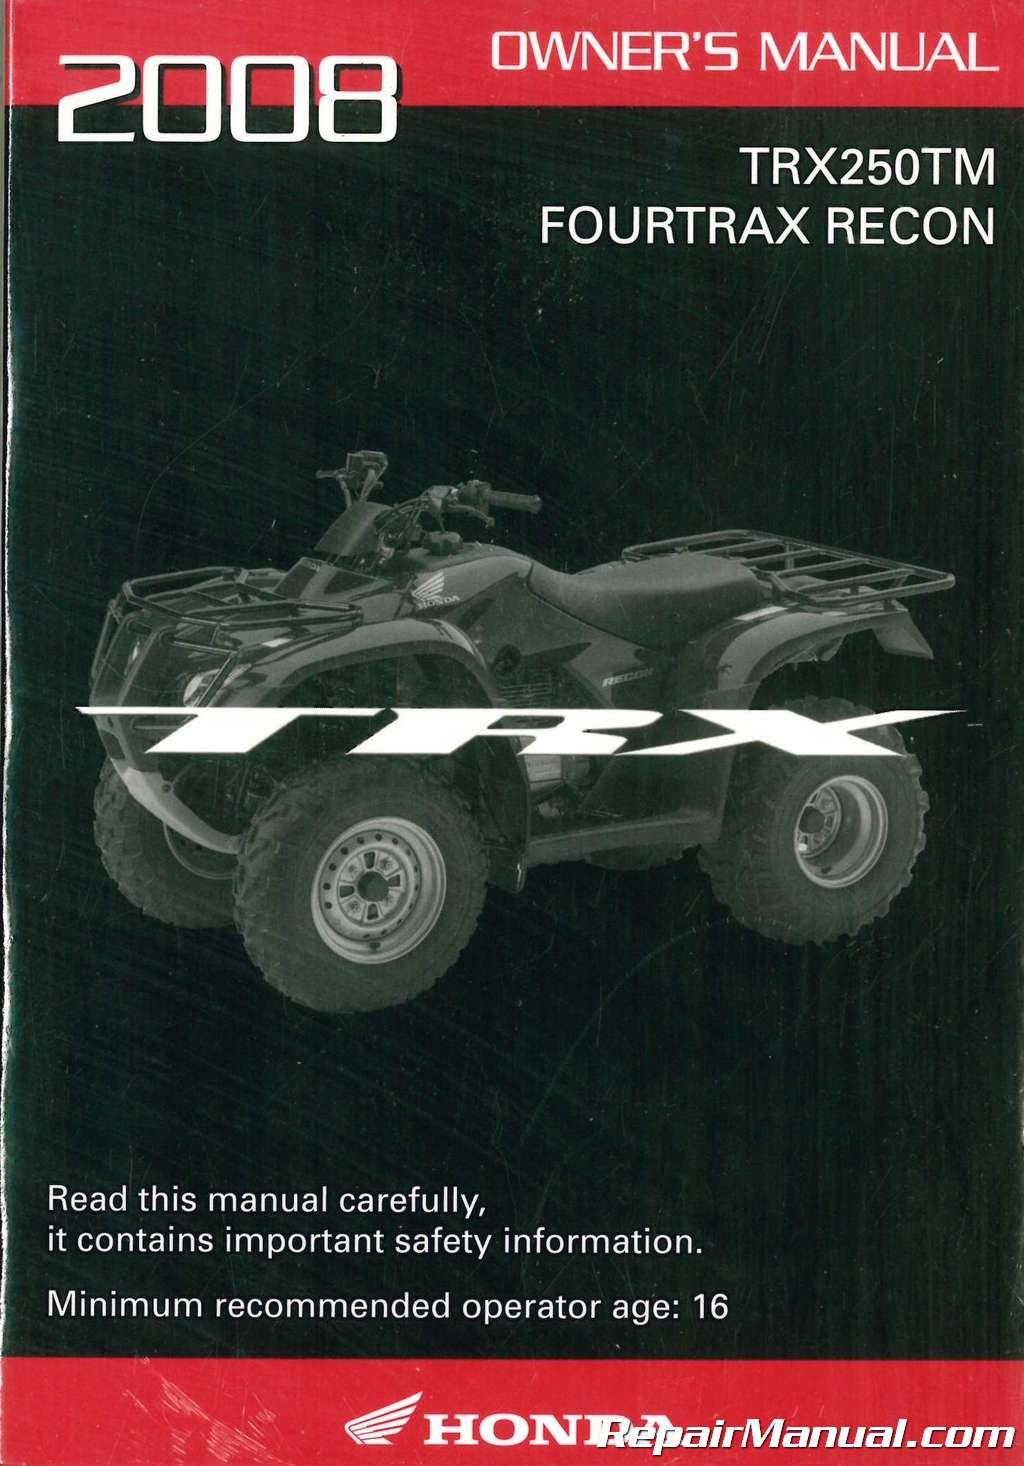 2008 Honda TRX250TM Fourtrax Recon ATV Owners Manual_001